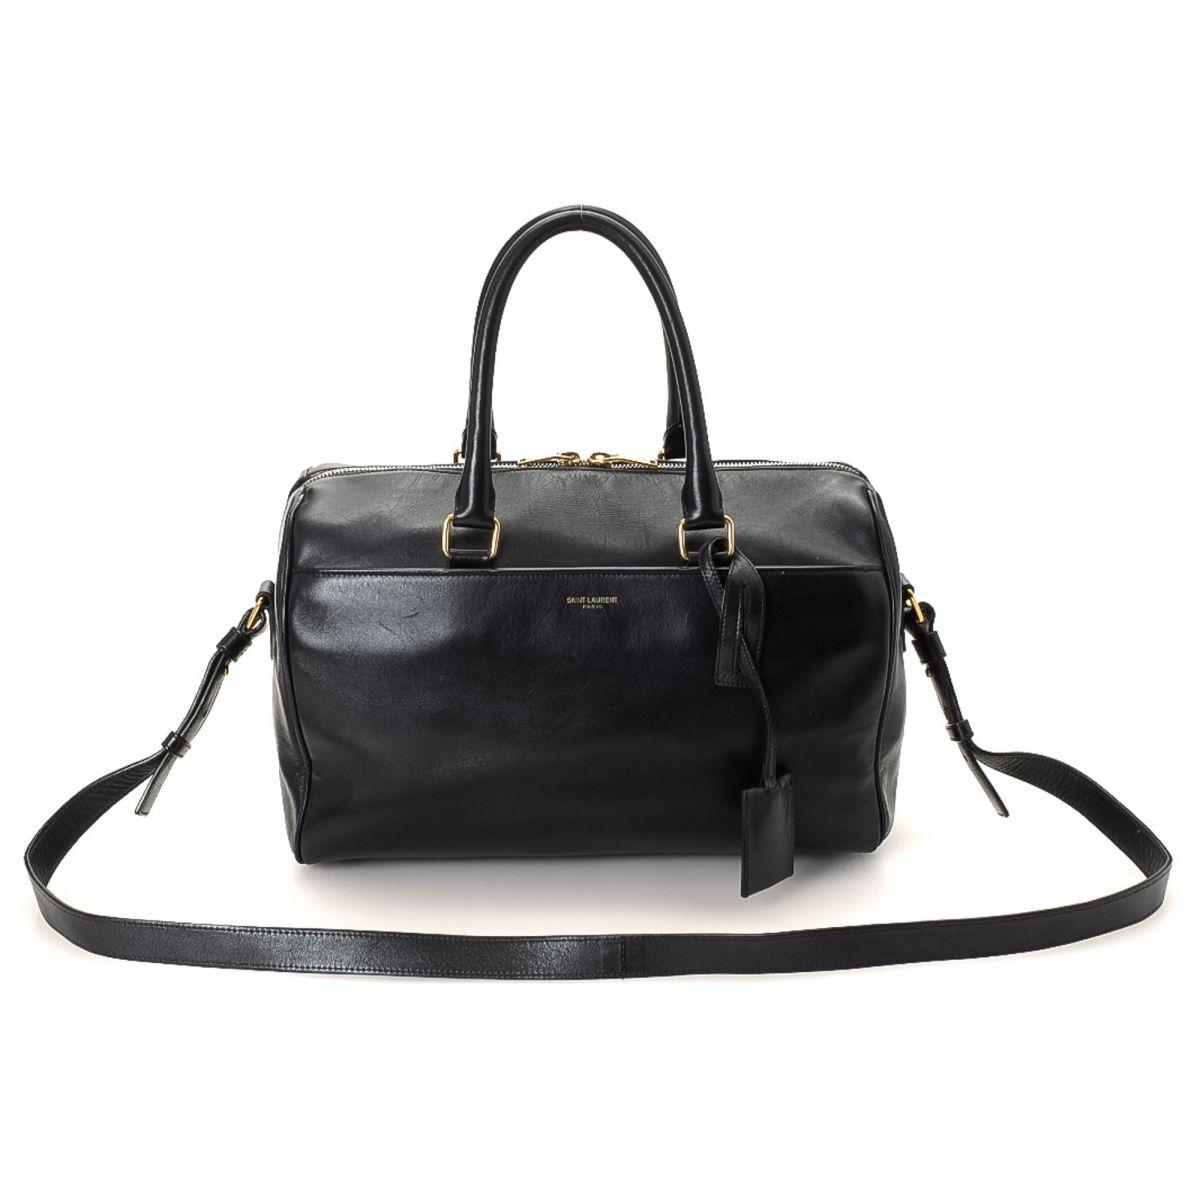 Slp Clothing | Saint Laurent Mens Shirt | Yves Saint Laurent Handbags